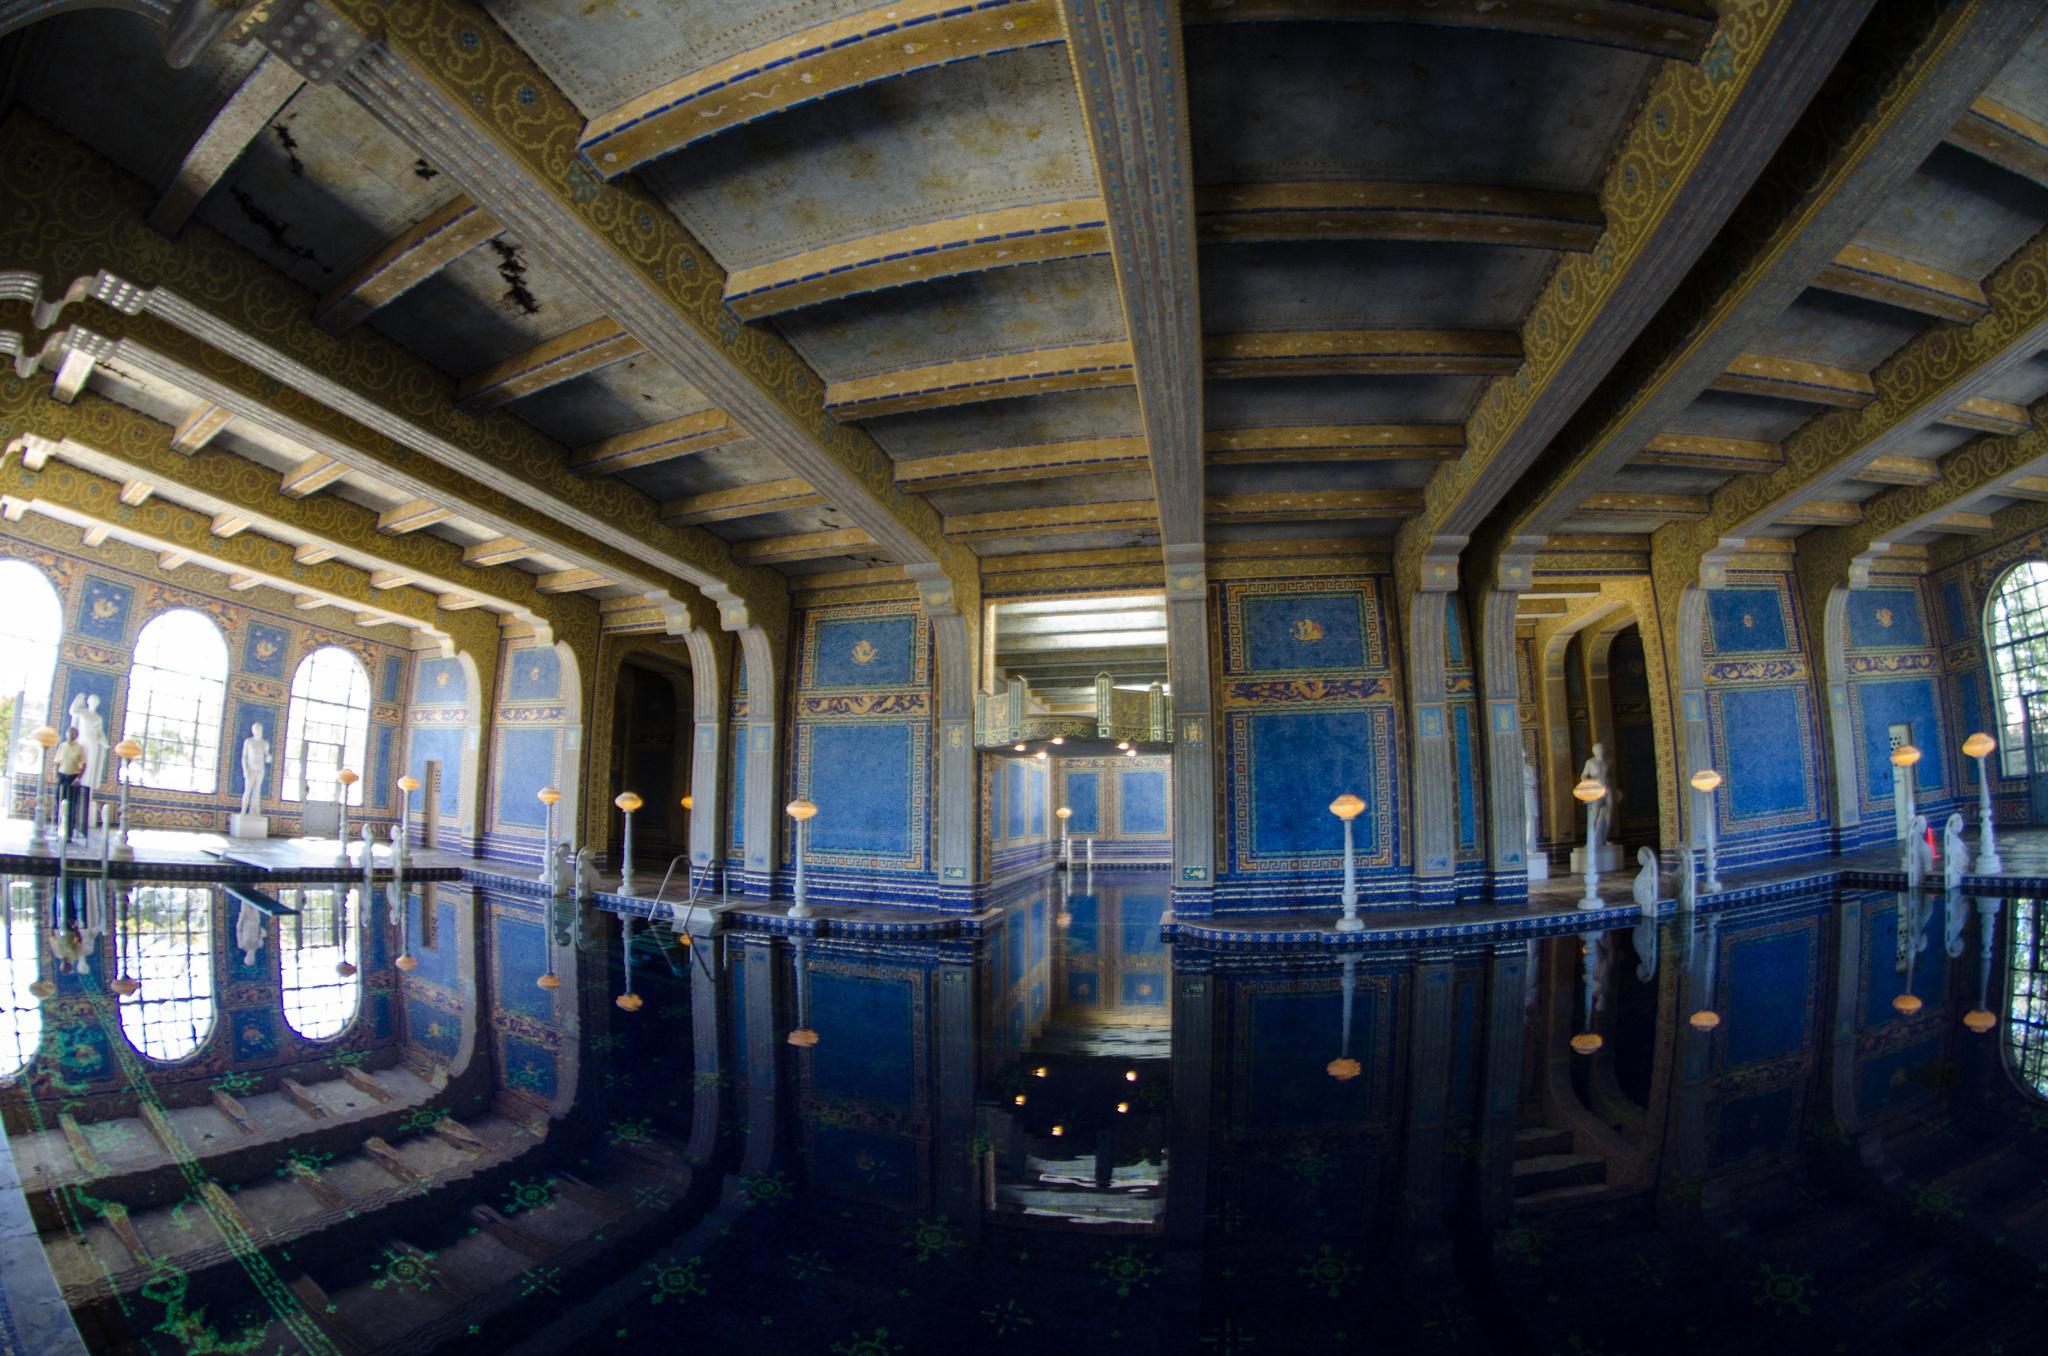 2015-03-26 - Hearst Castle - 084